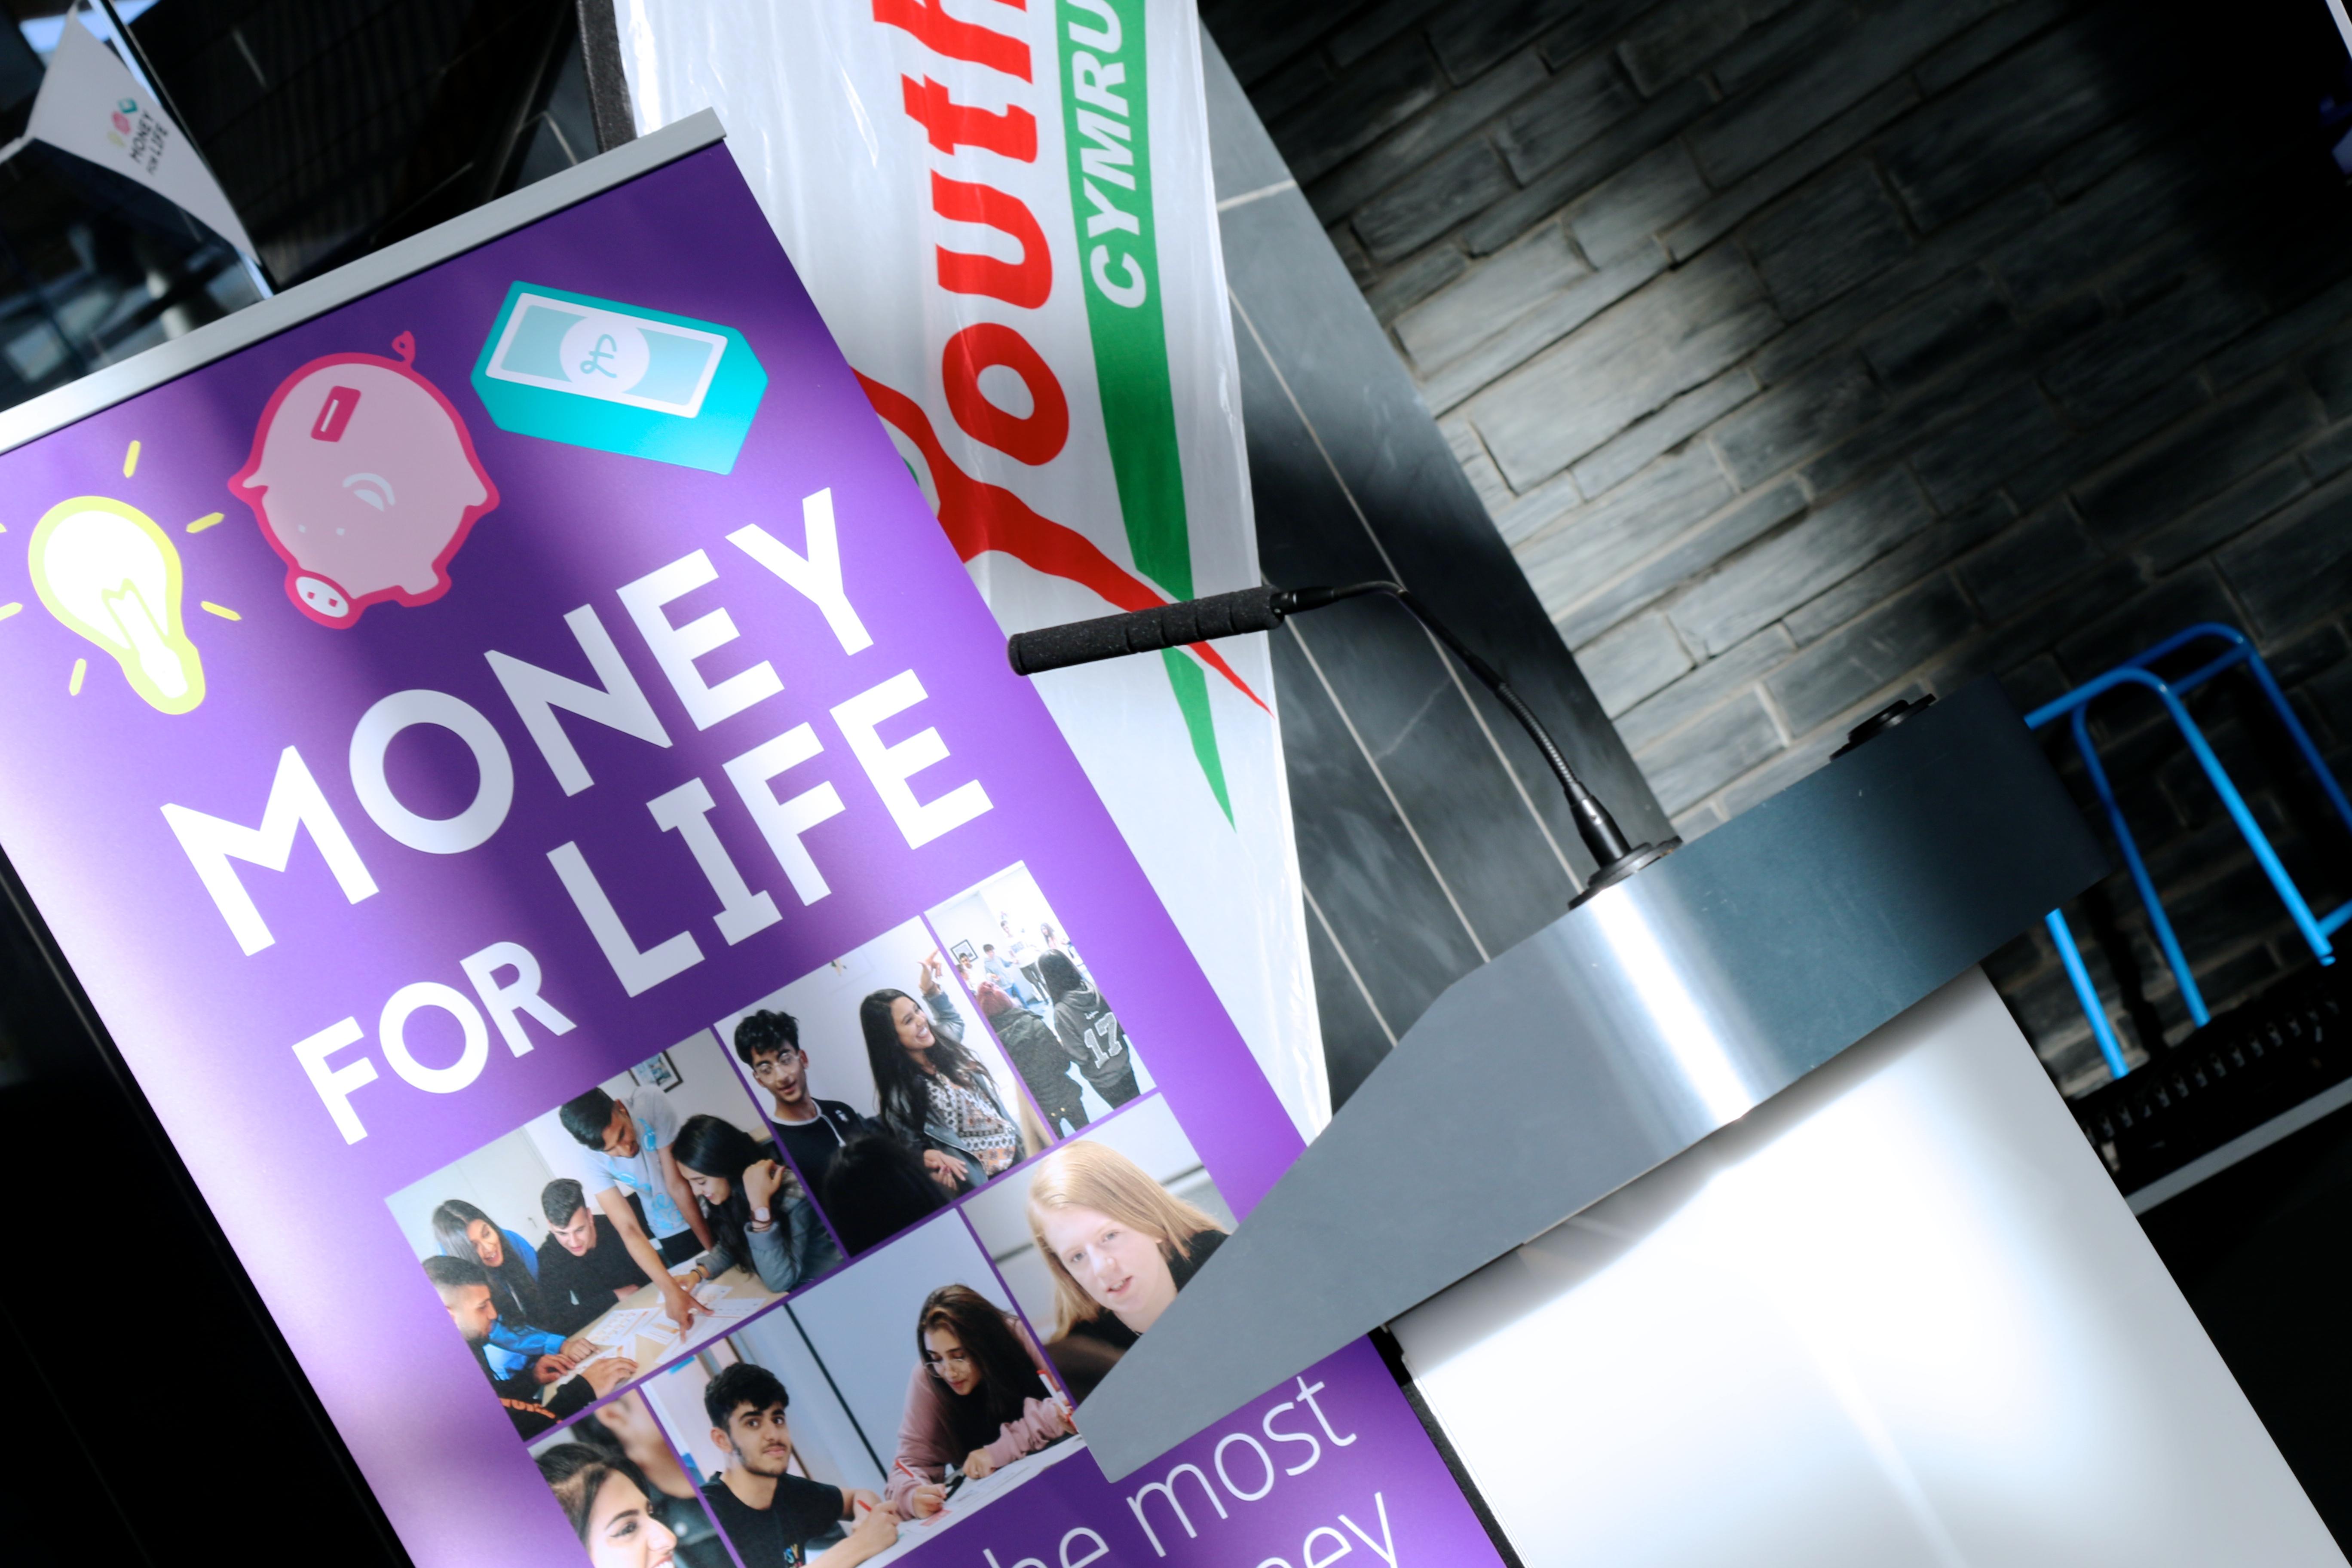 Celebrating Money for Life 2017